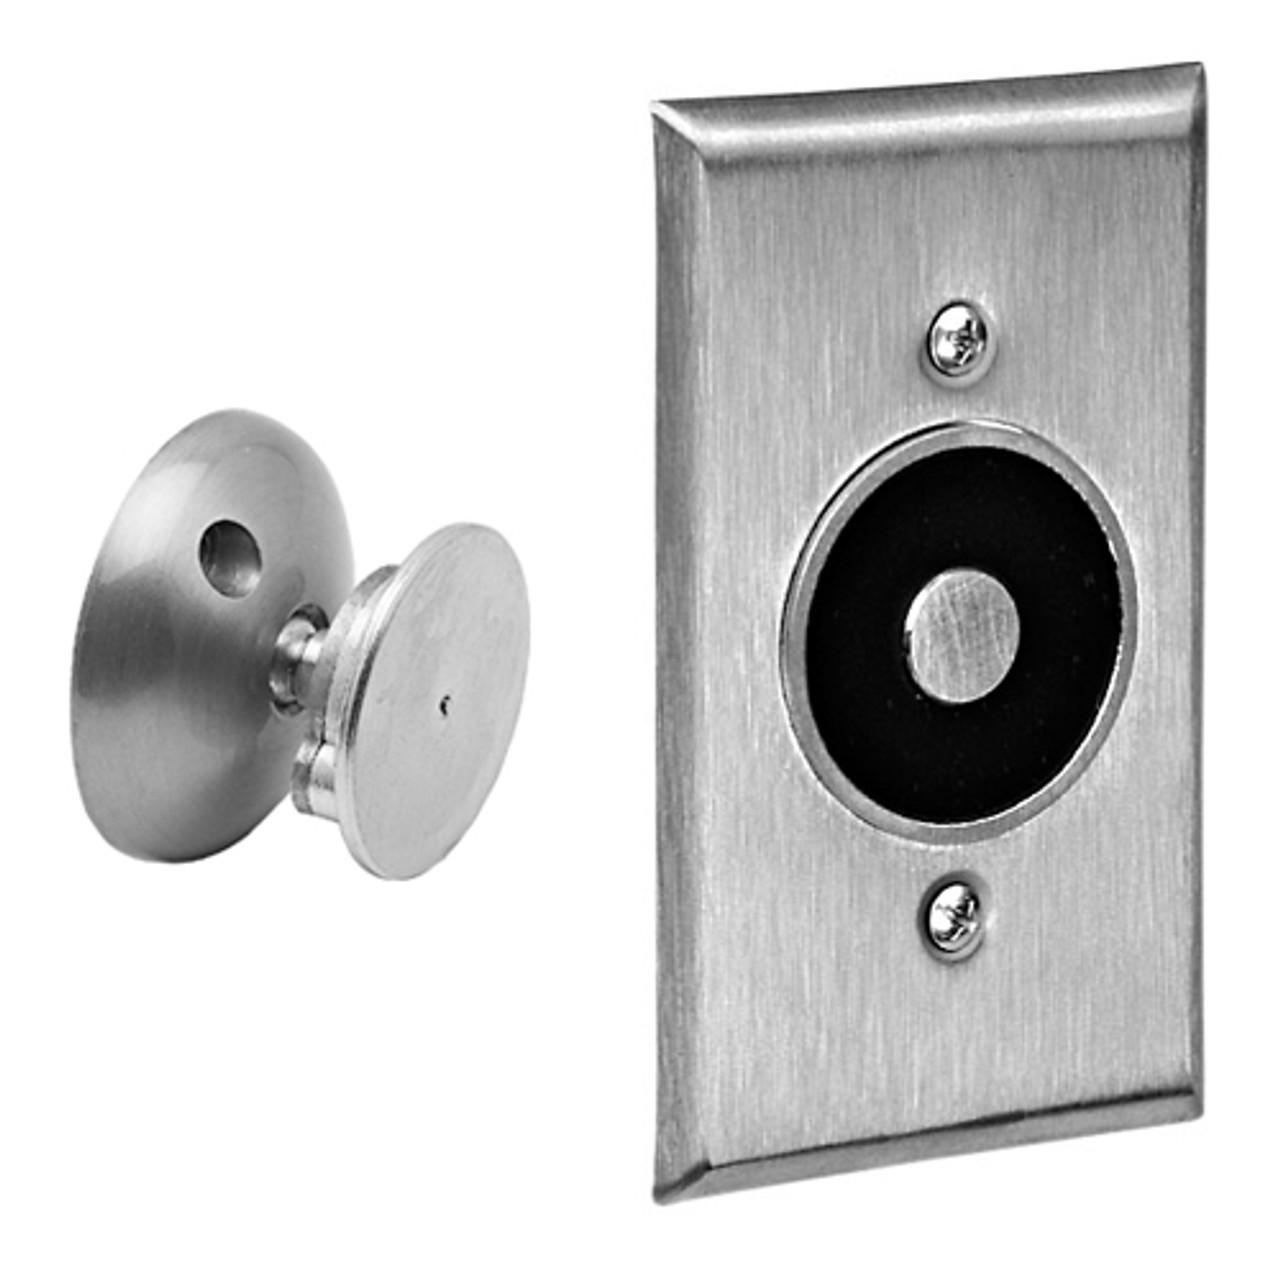 2806-US28 DynaLock 2800 Series Low Profile Wall Mount Electromagnetic Door Holder in Satin Aluminum